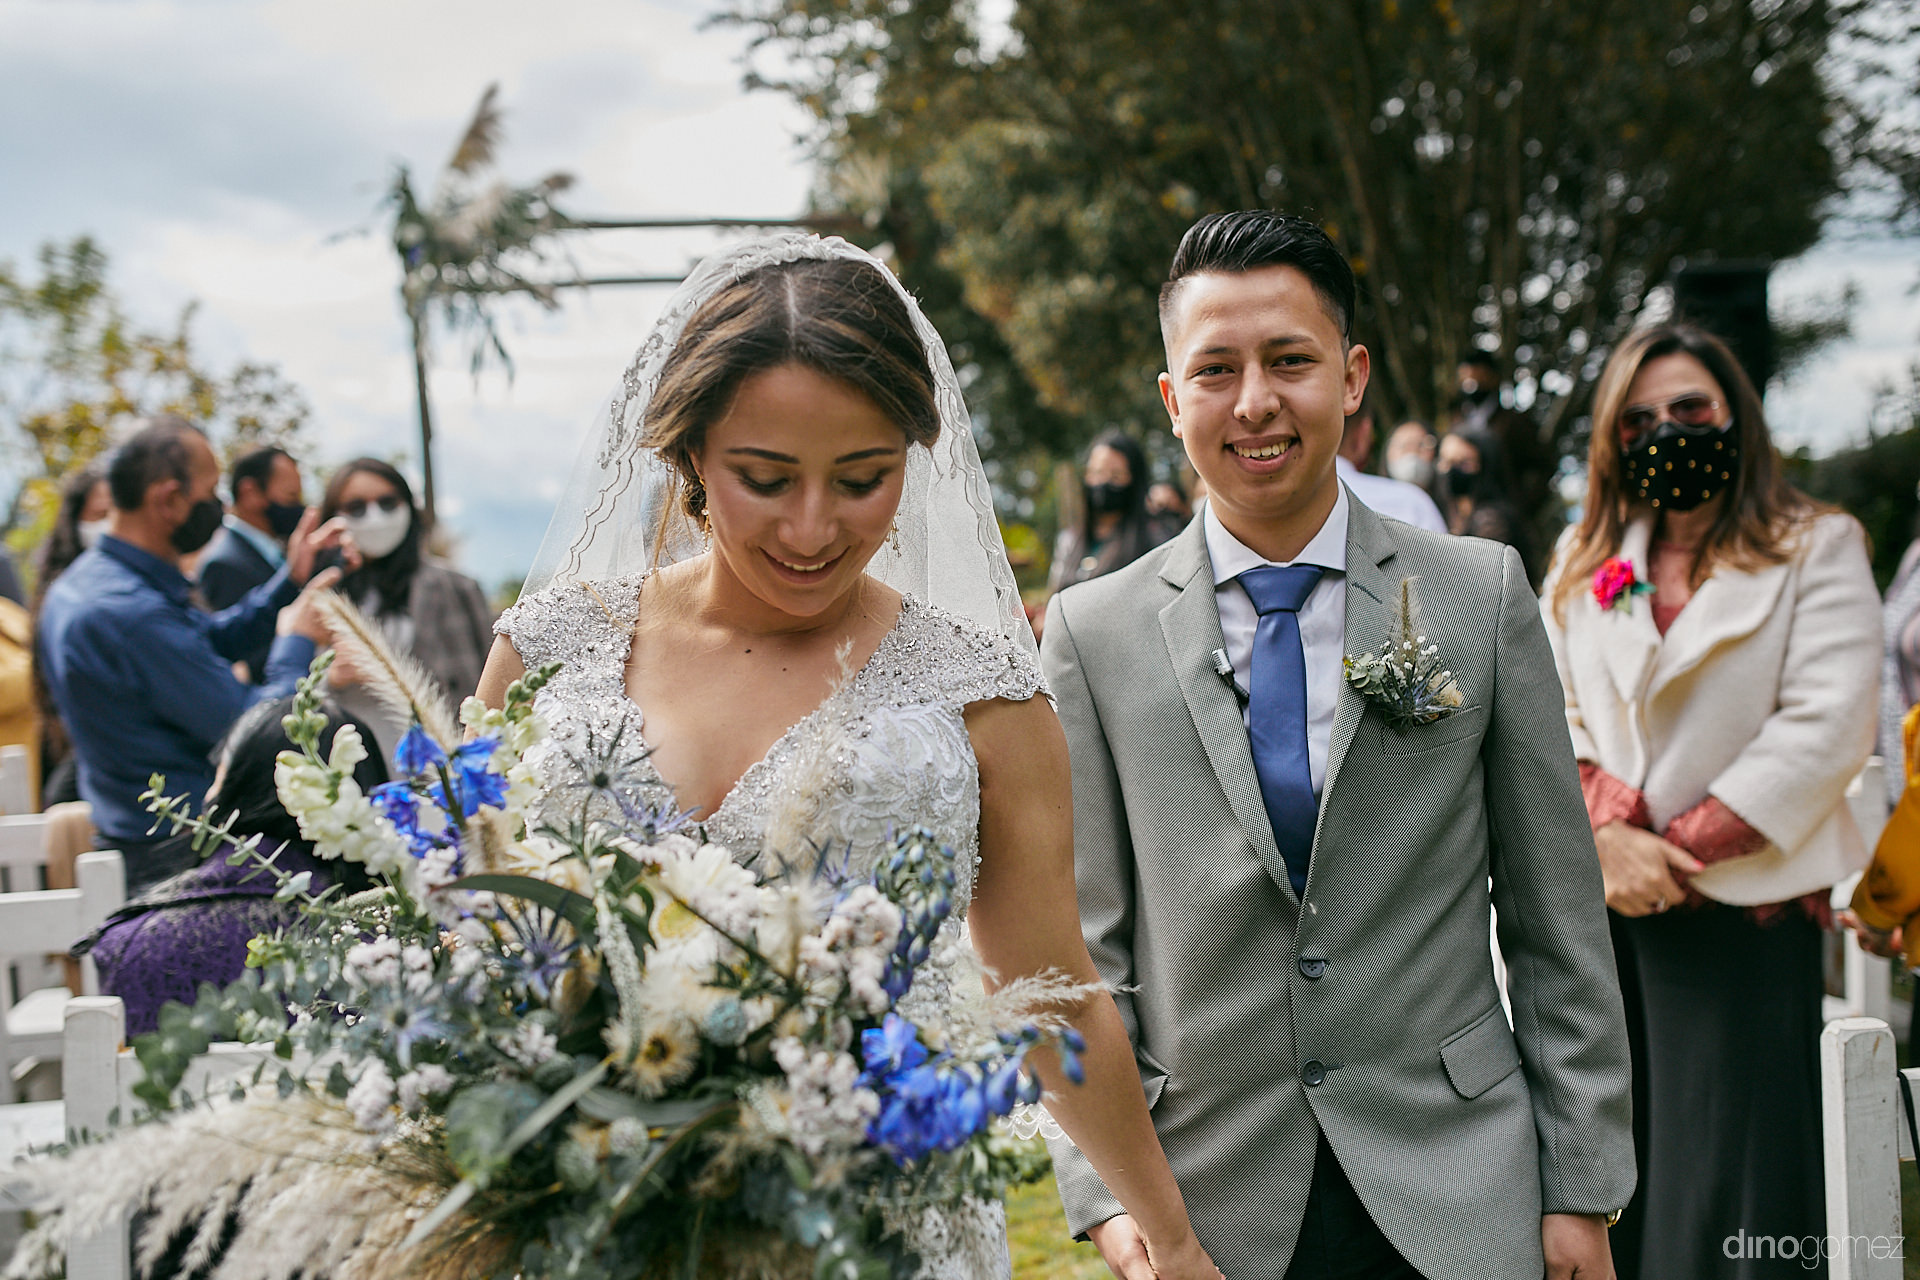 040 - Diy Budget Destination Weddings Can Be Prety Too!